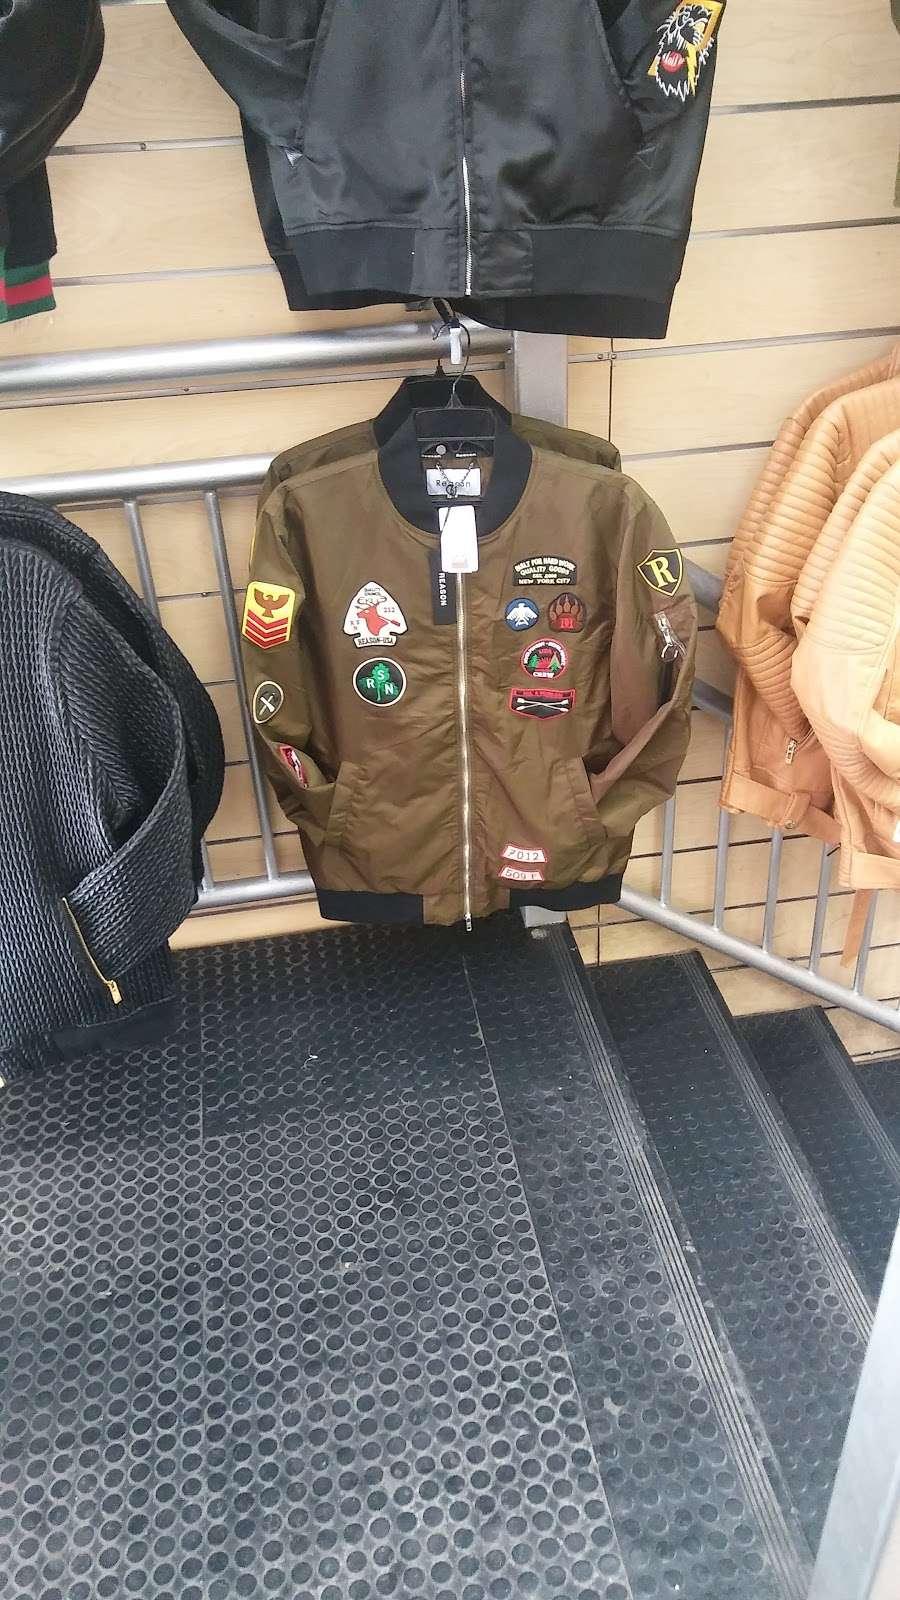 Dr Jays - clothing store  | Photo 8 of 10 | Address: 215 E Fordham Rd, The Bronx, NY 10458, USA | Phone: (718) 220-3354